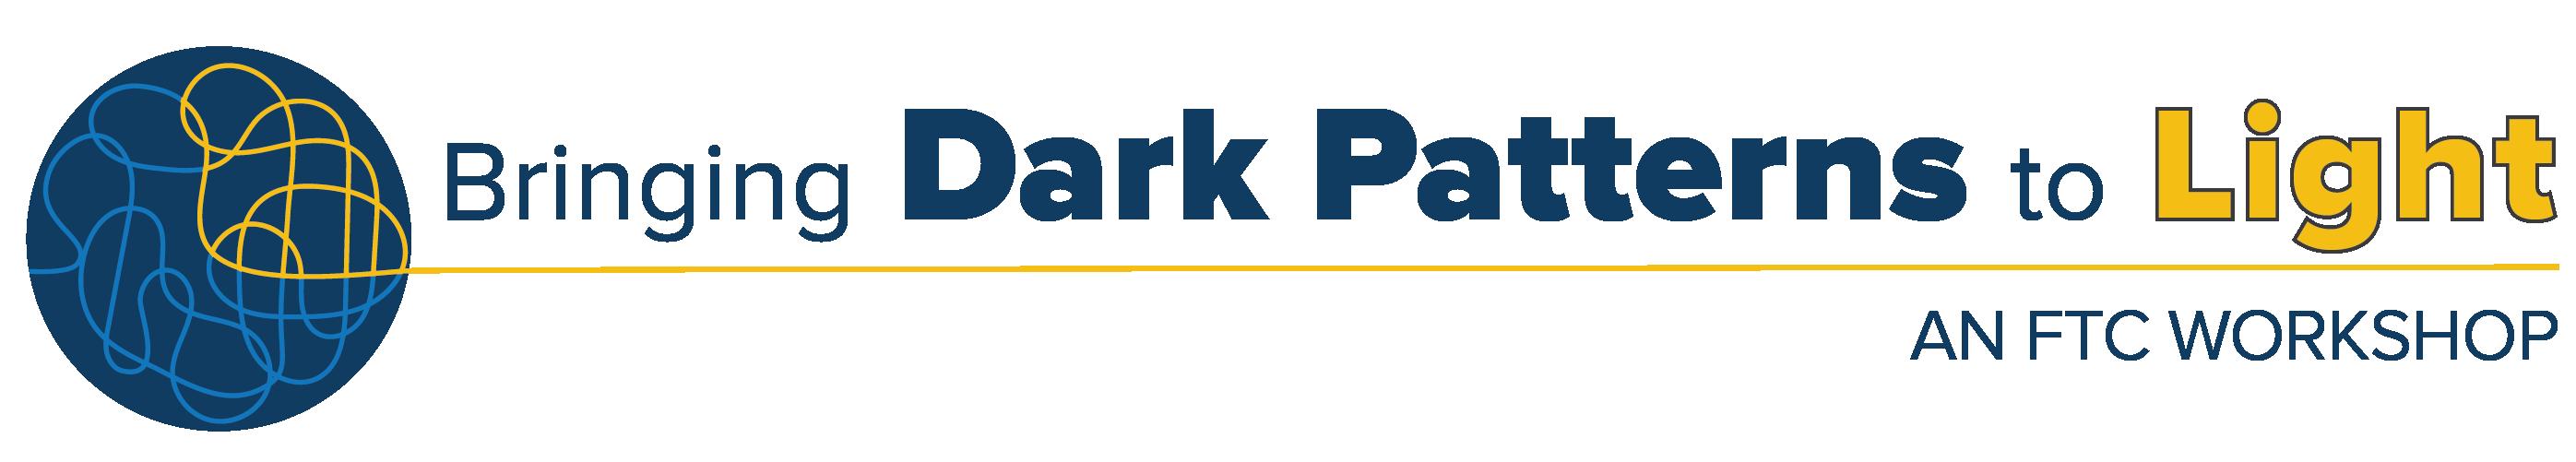 Bringing Dark Patterns to Light: An FTC Workshop